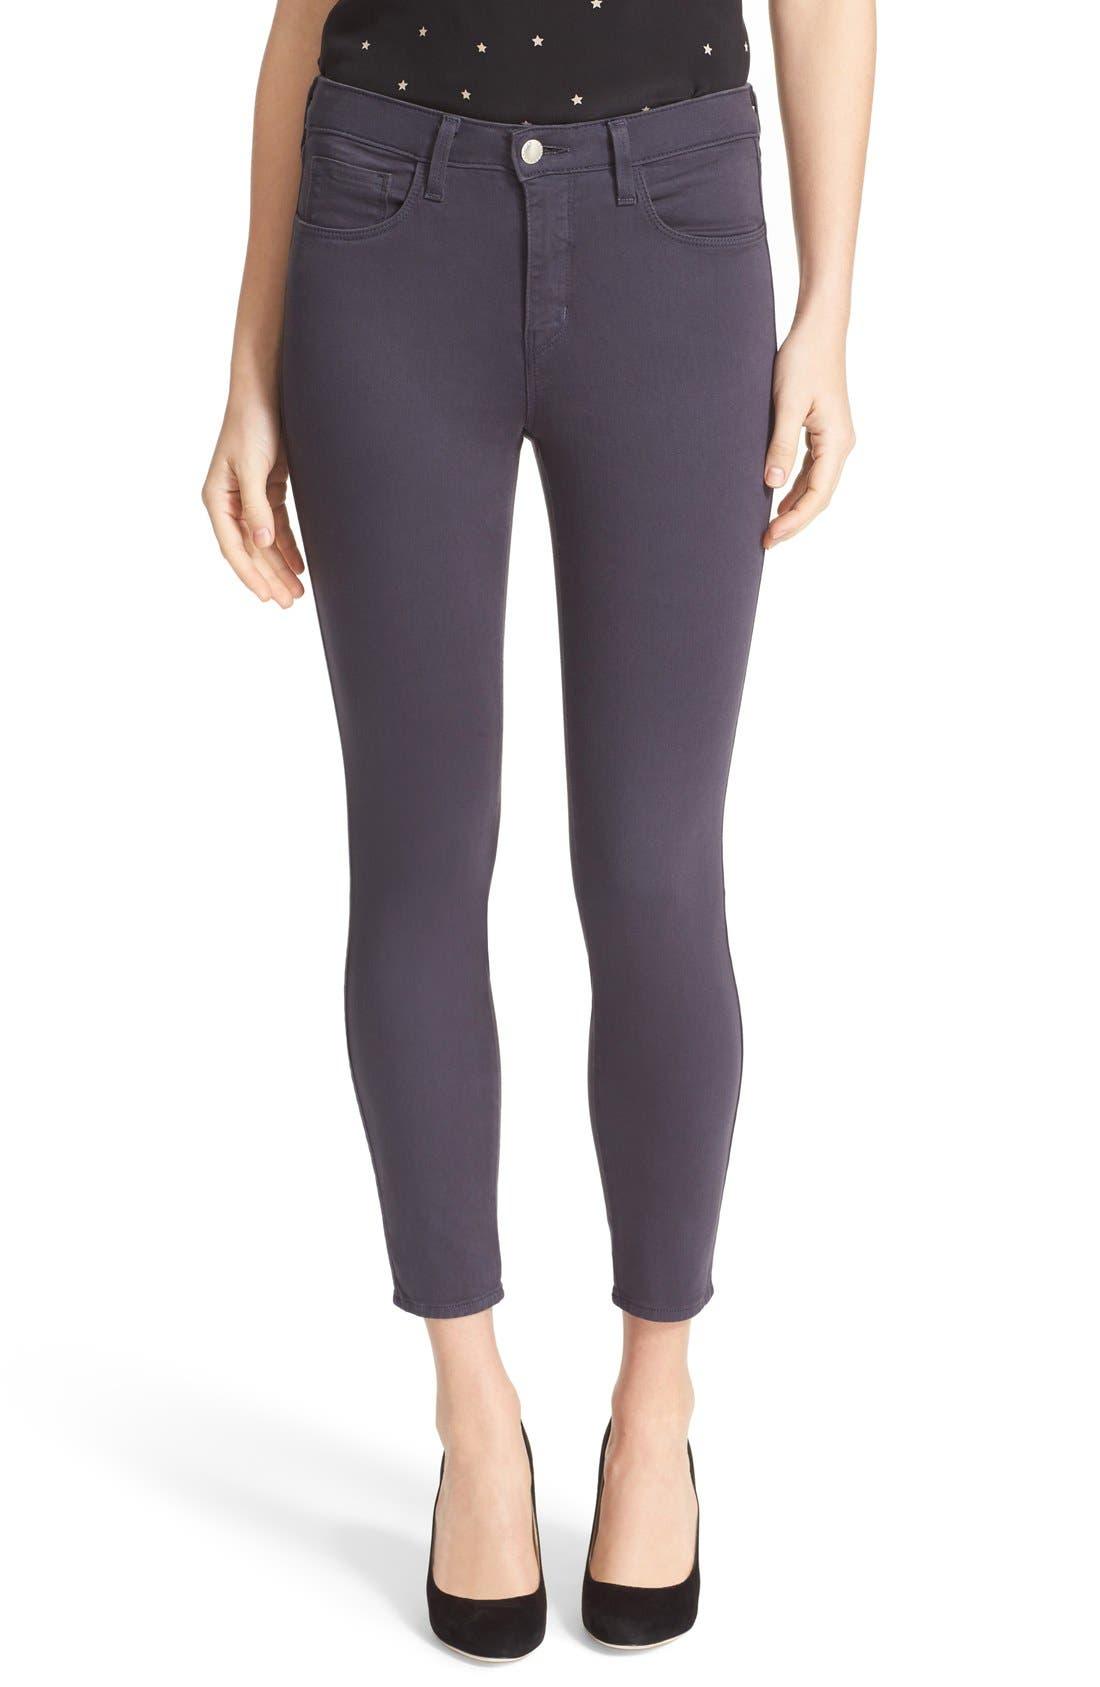 LAGENCE High Waist Skinny Ankle Jeans